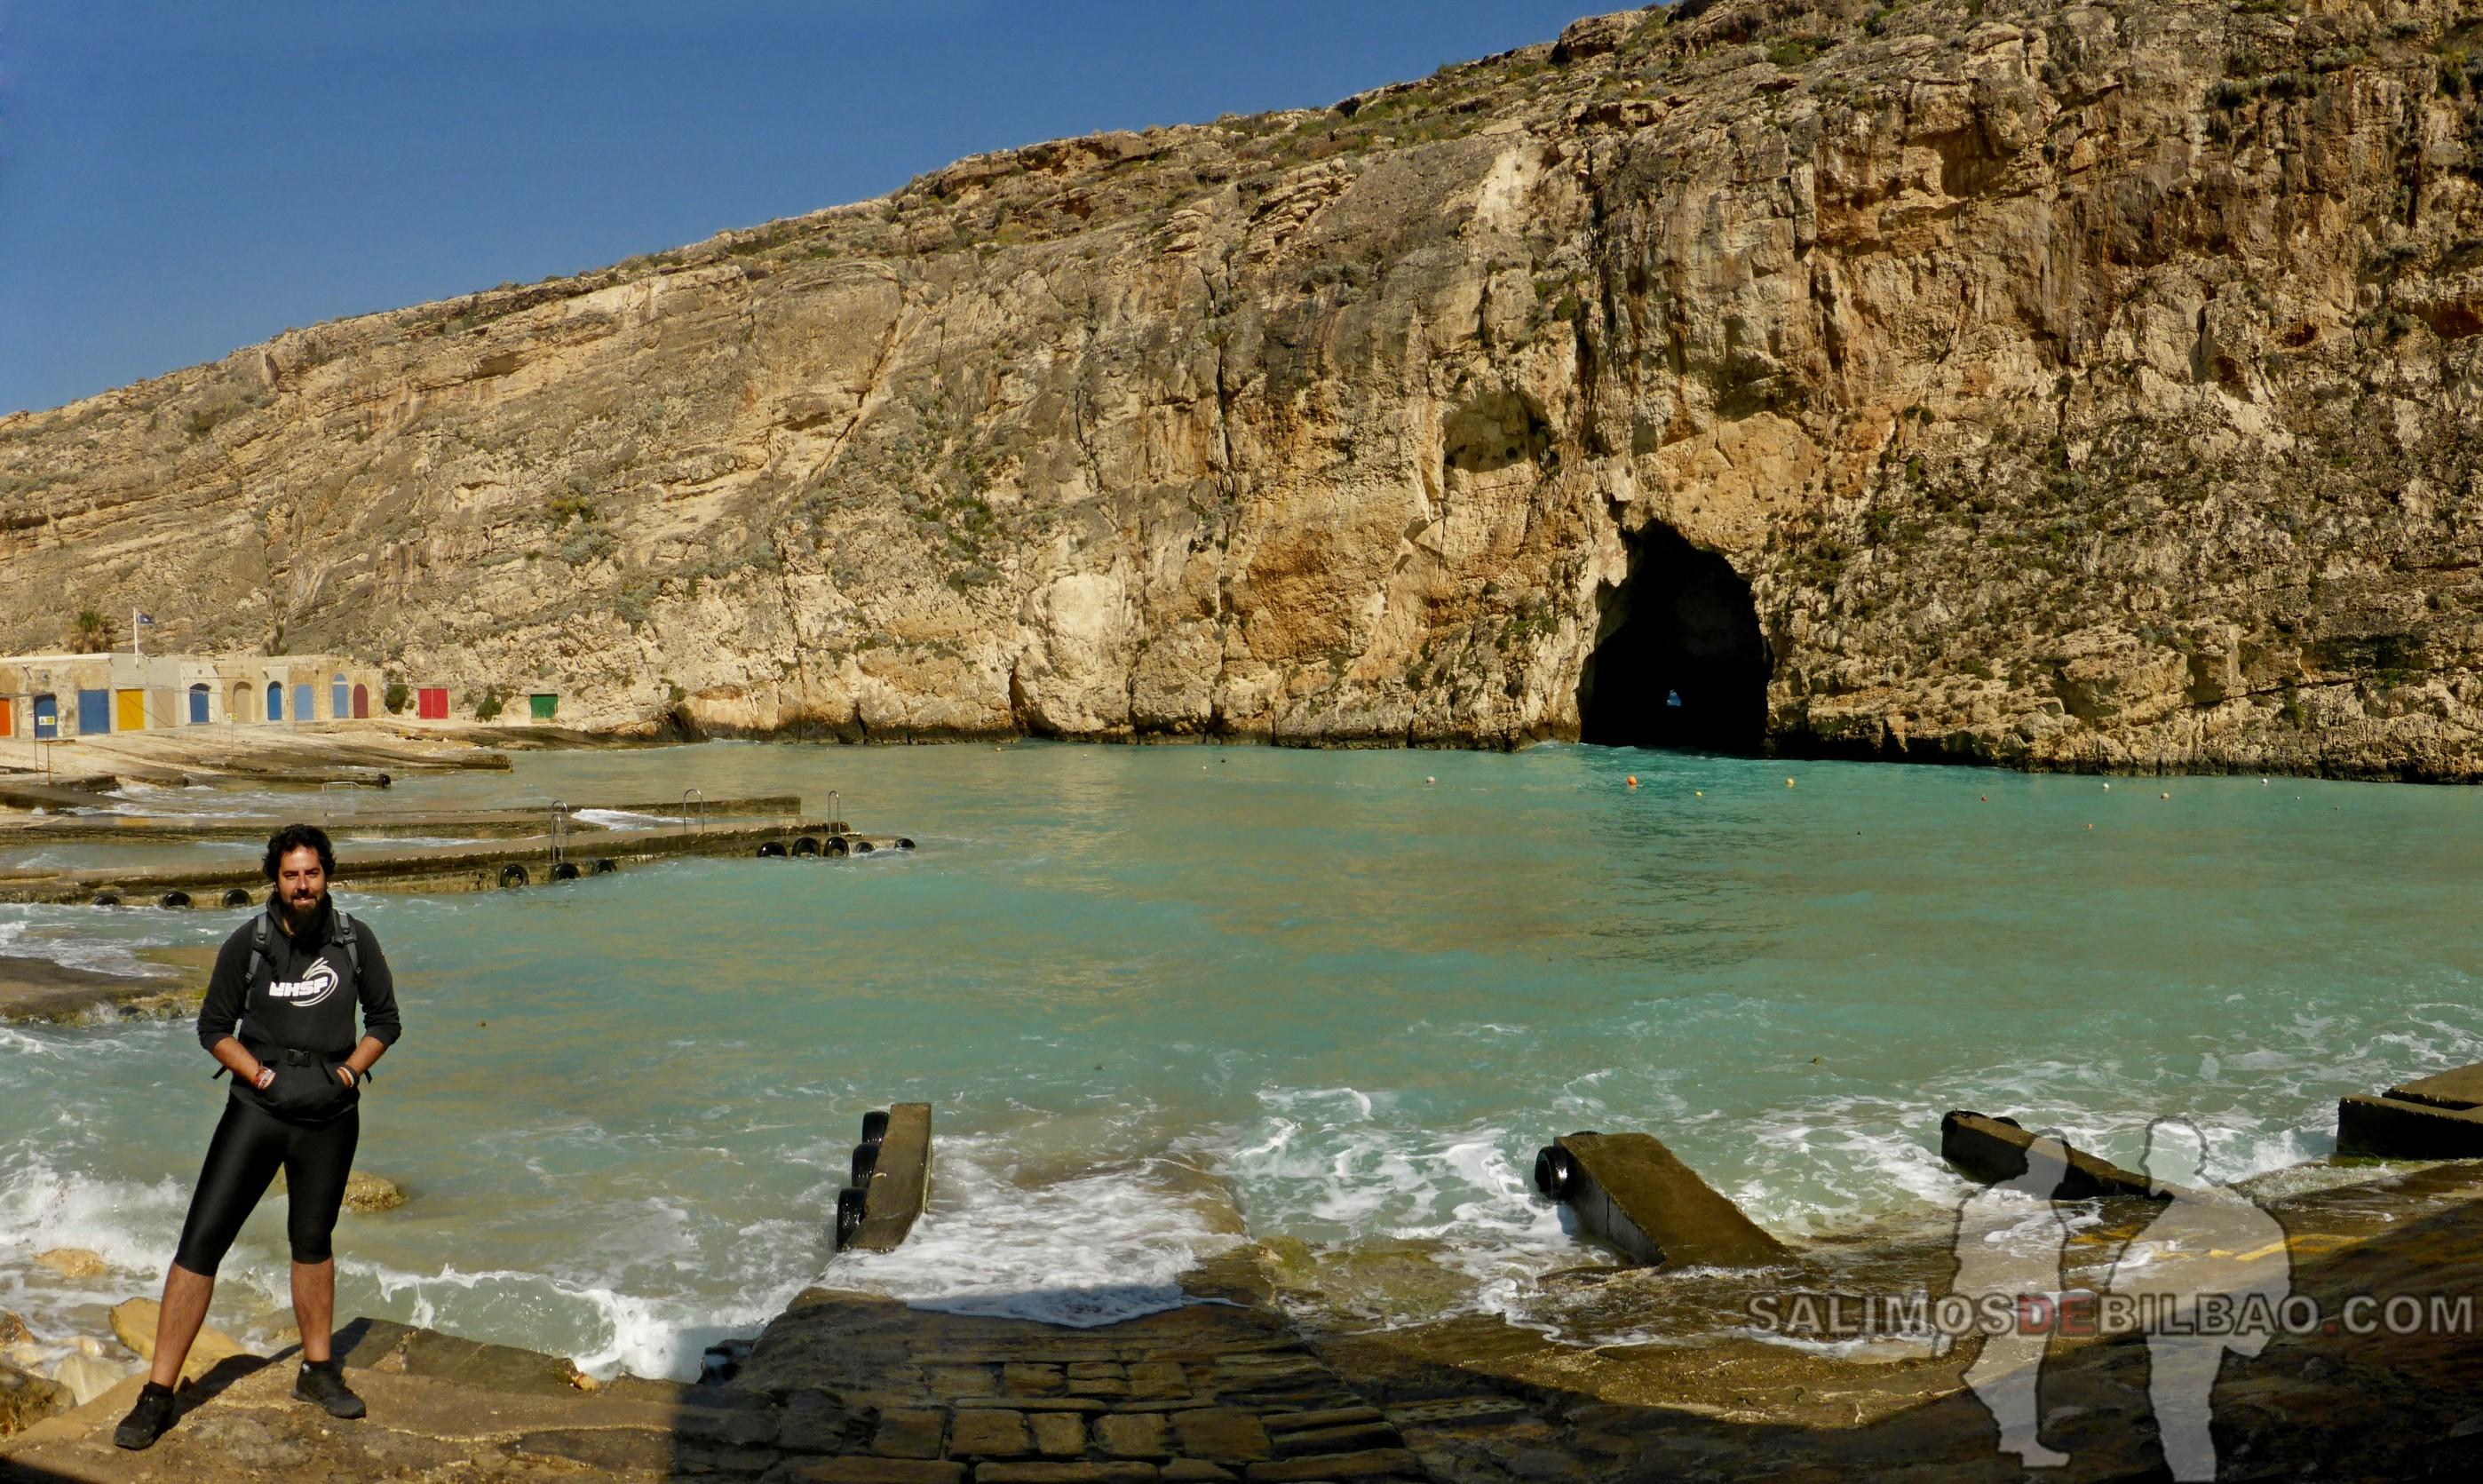 0531. Katz, Pano, Inland Sea, Gozo